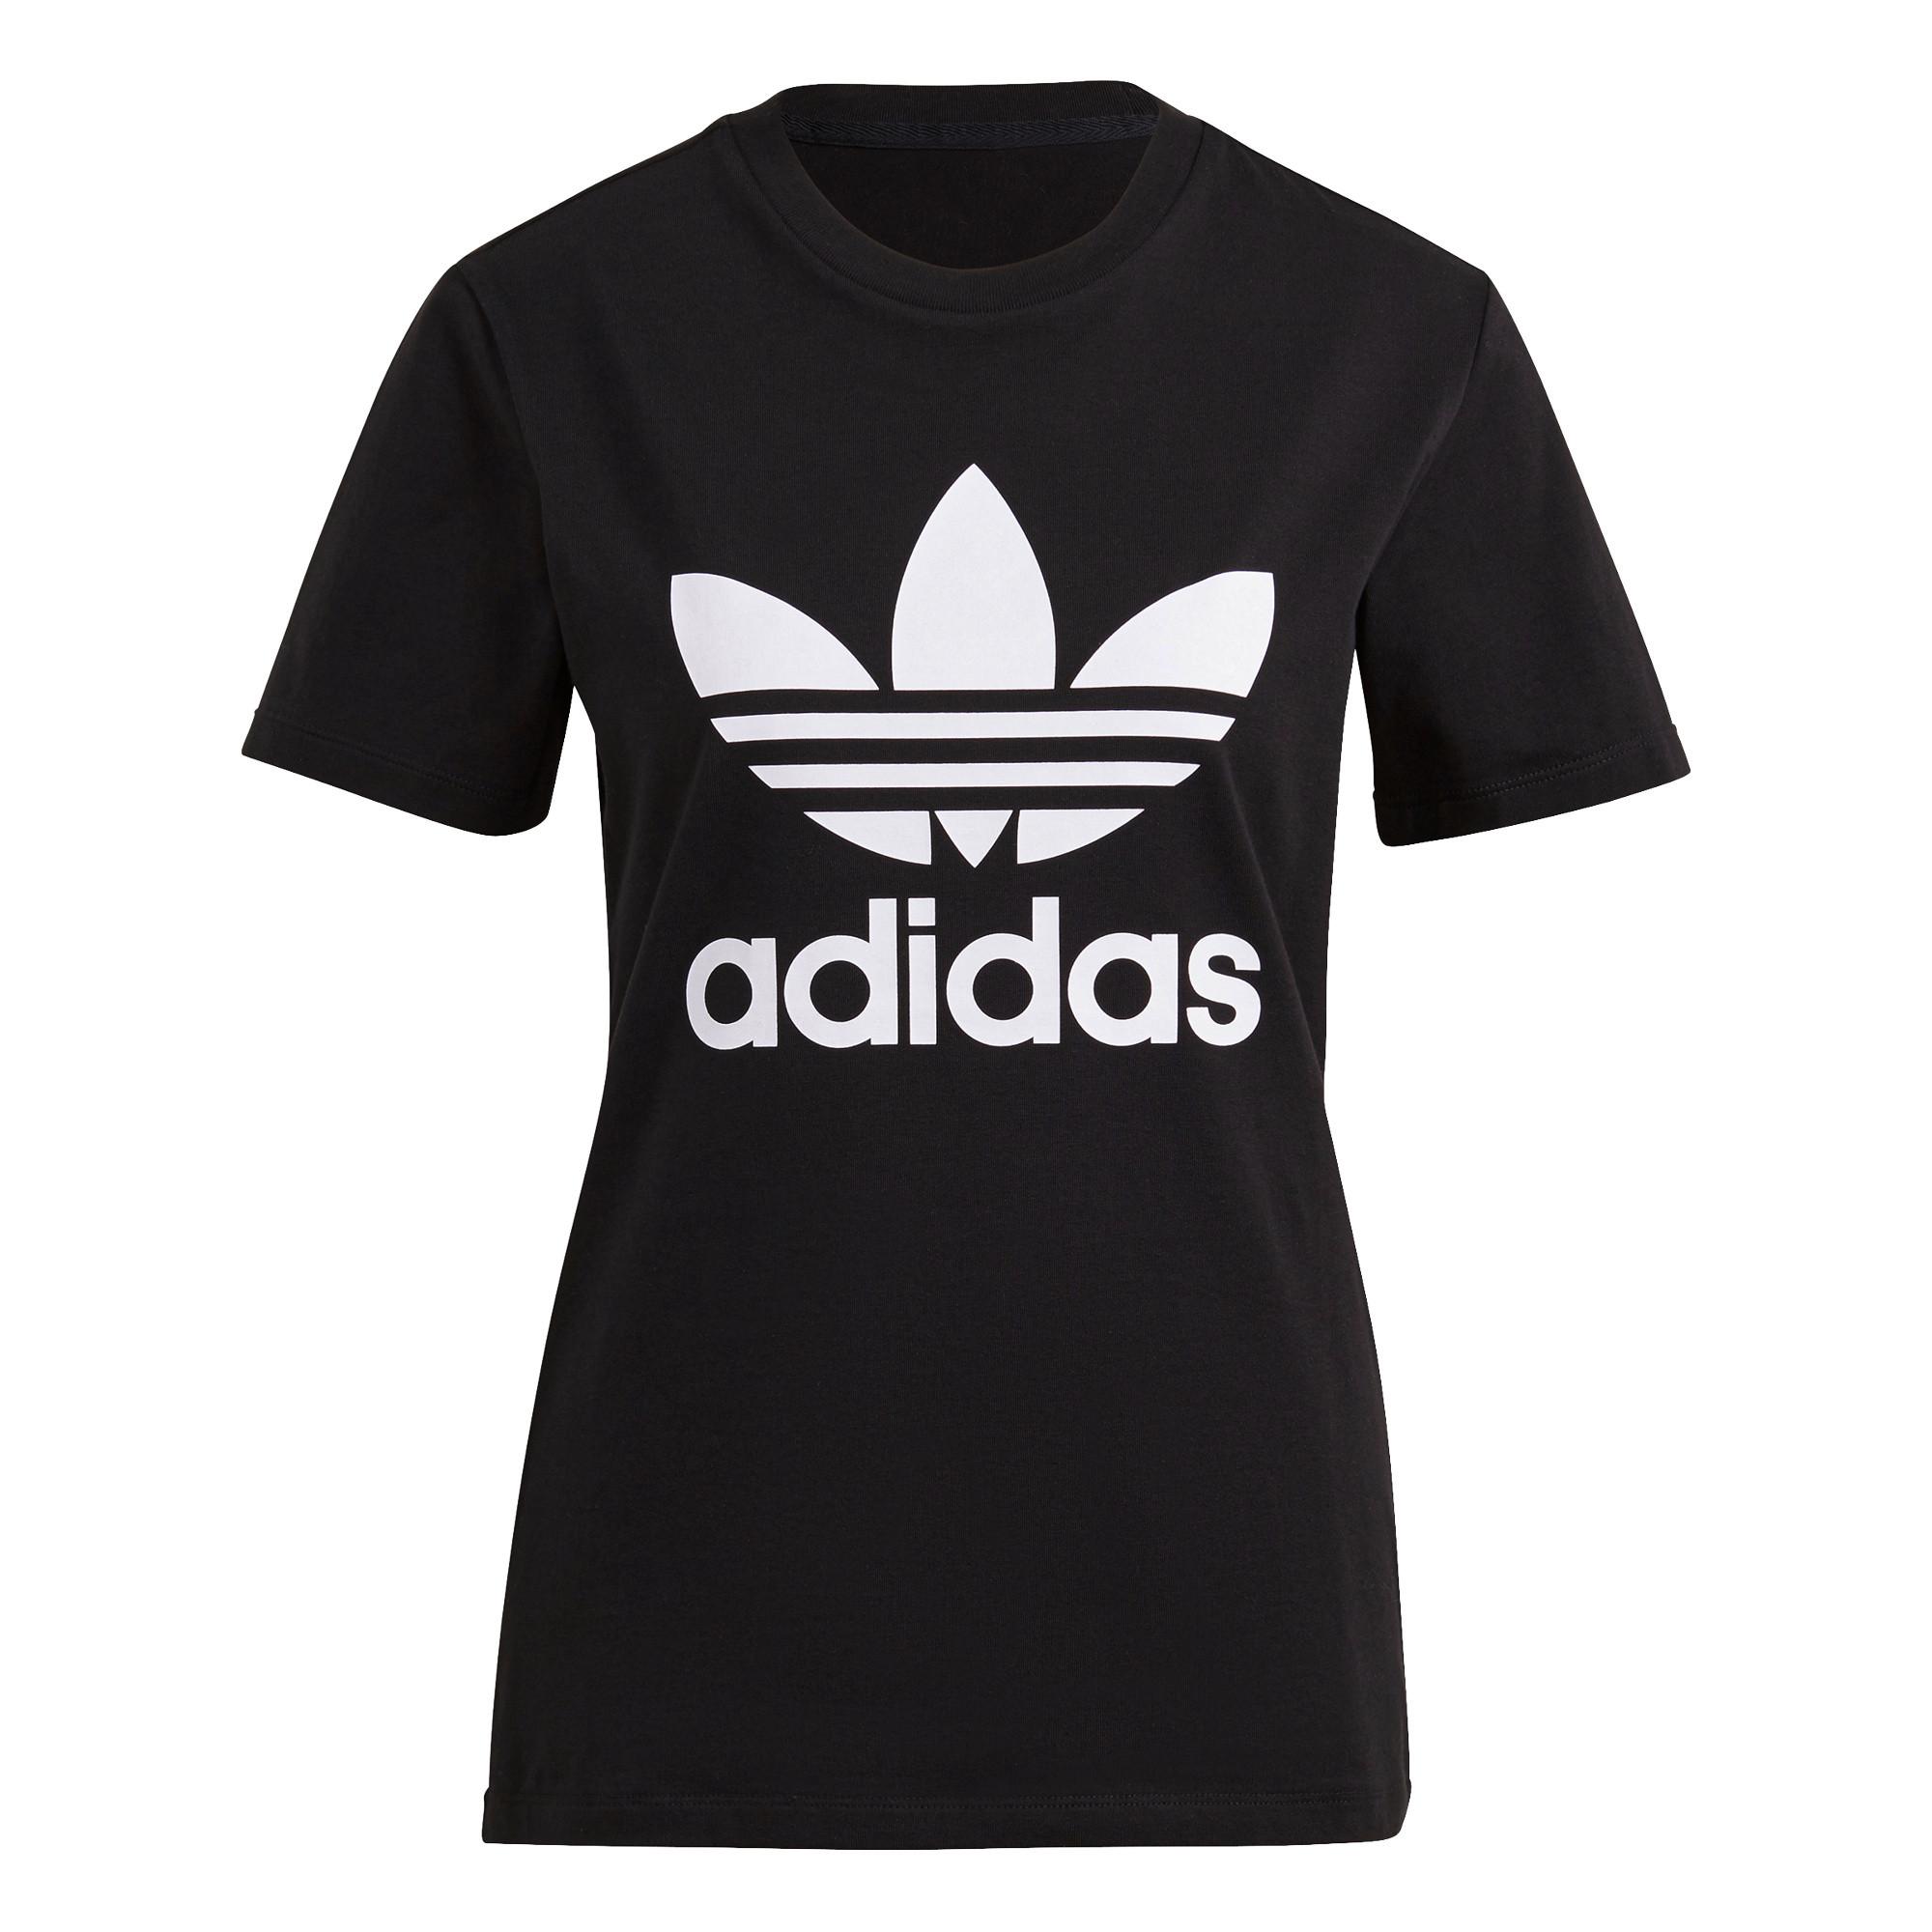 T-shirt adicolor Classics Trefoil, Nero, large image number 0